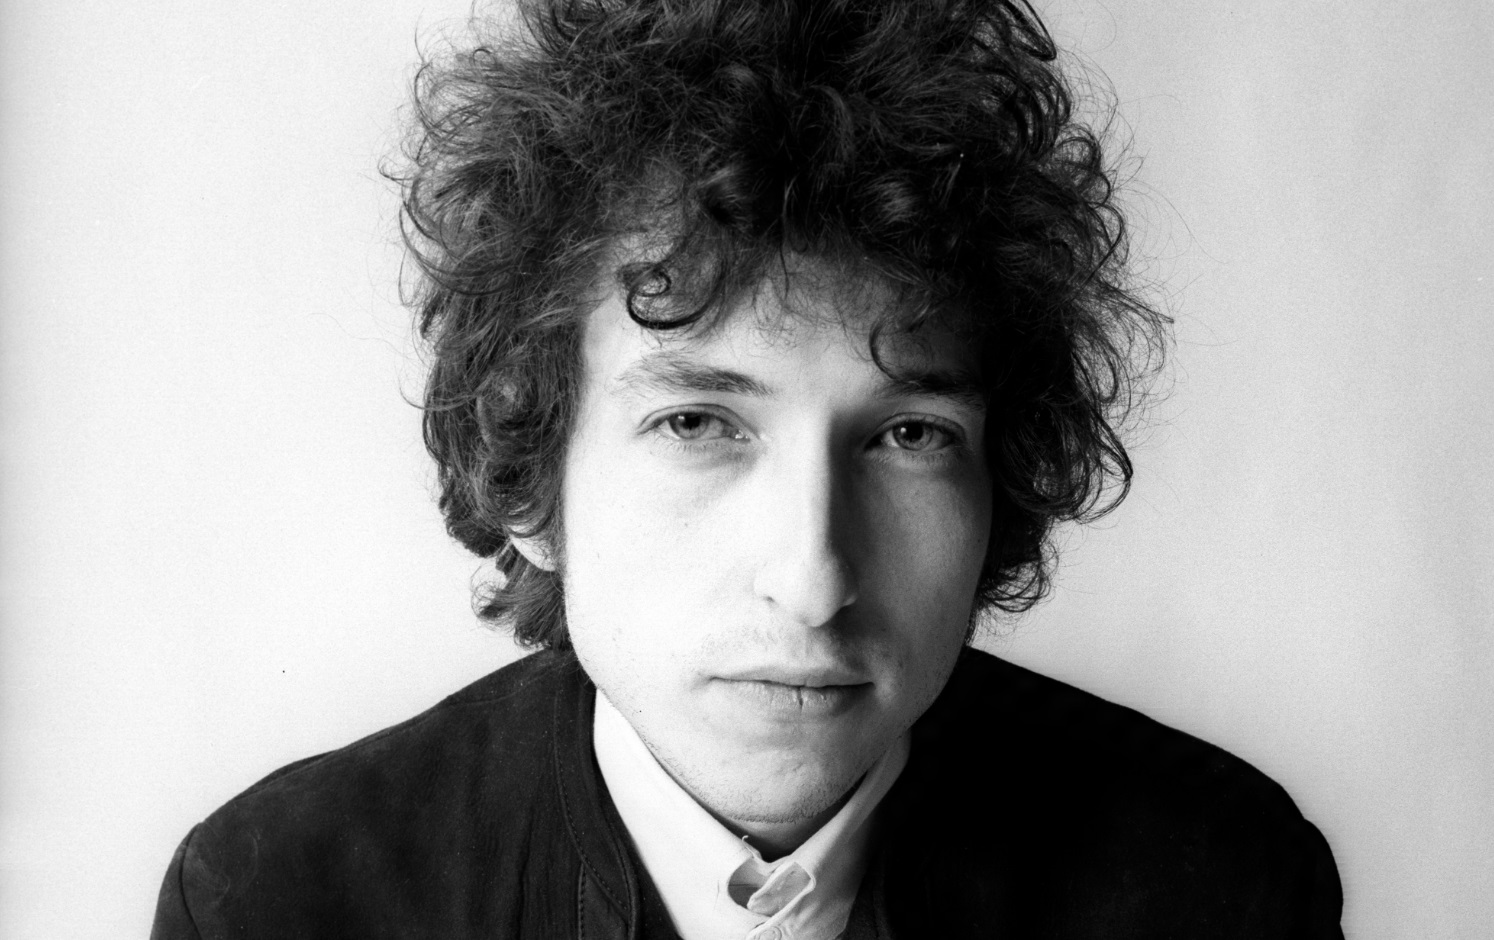 24 de Maio – Bob Dylan e Nova Odessa (SP) – 2017